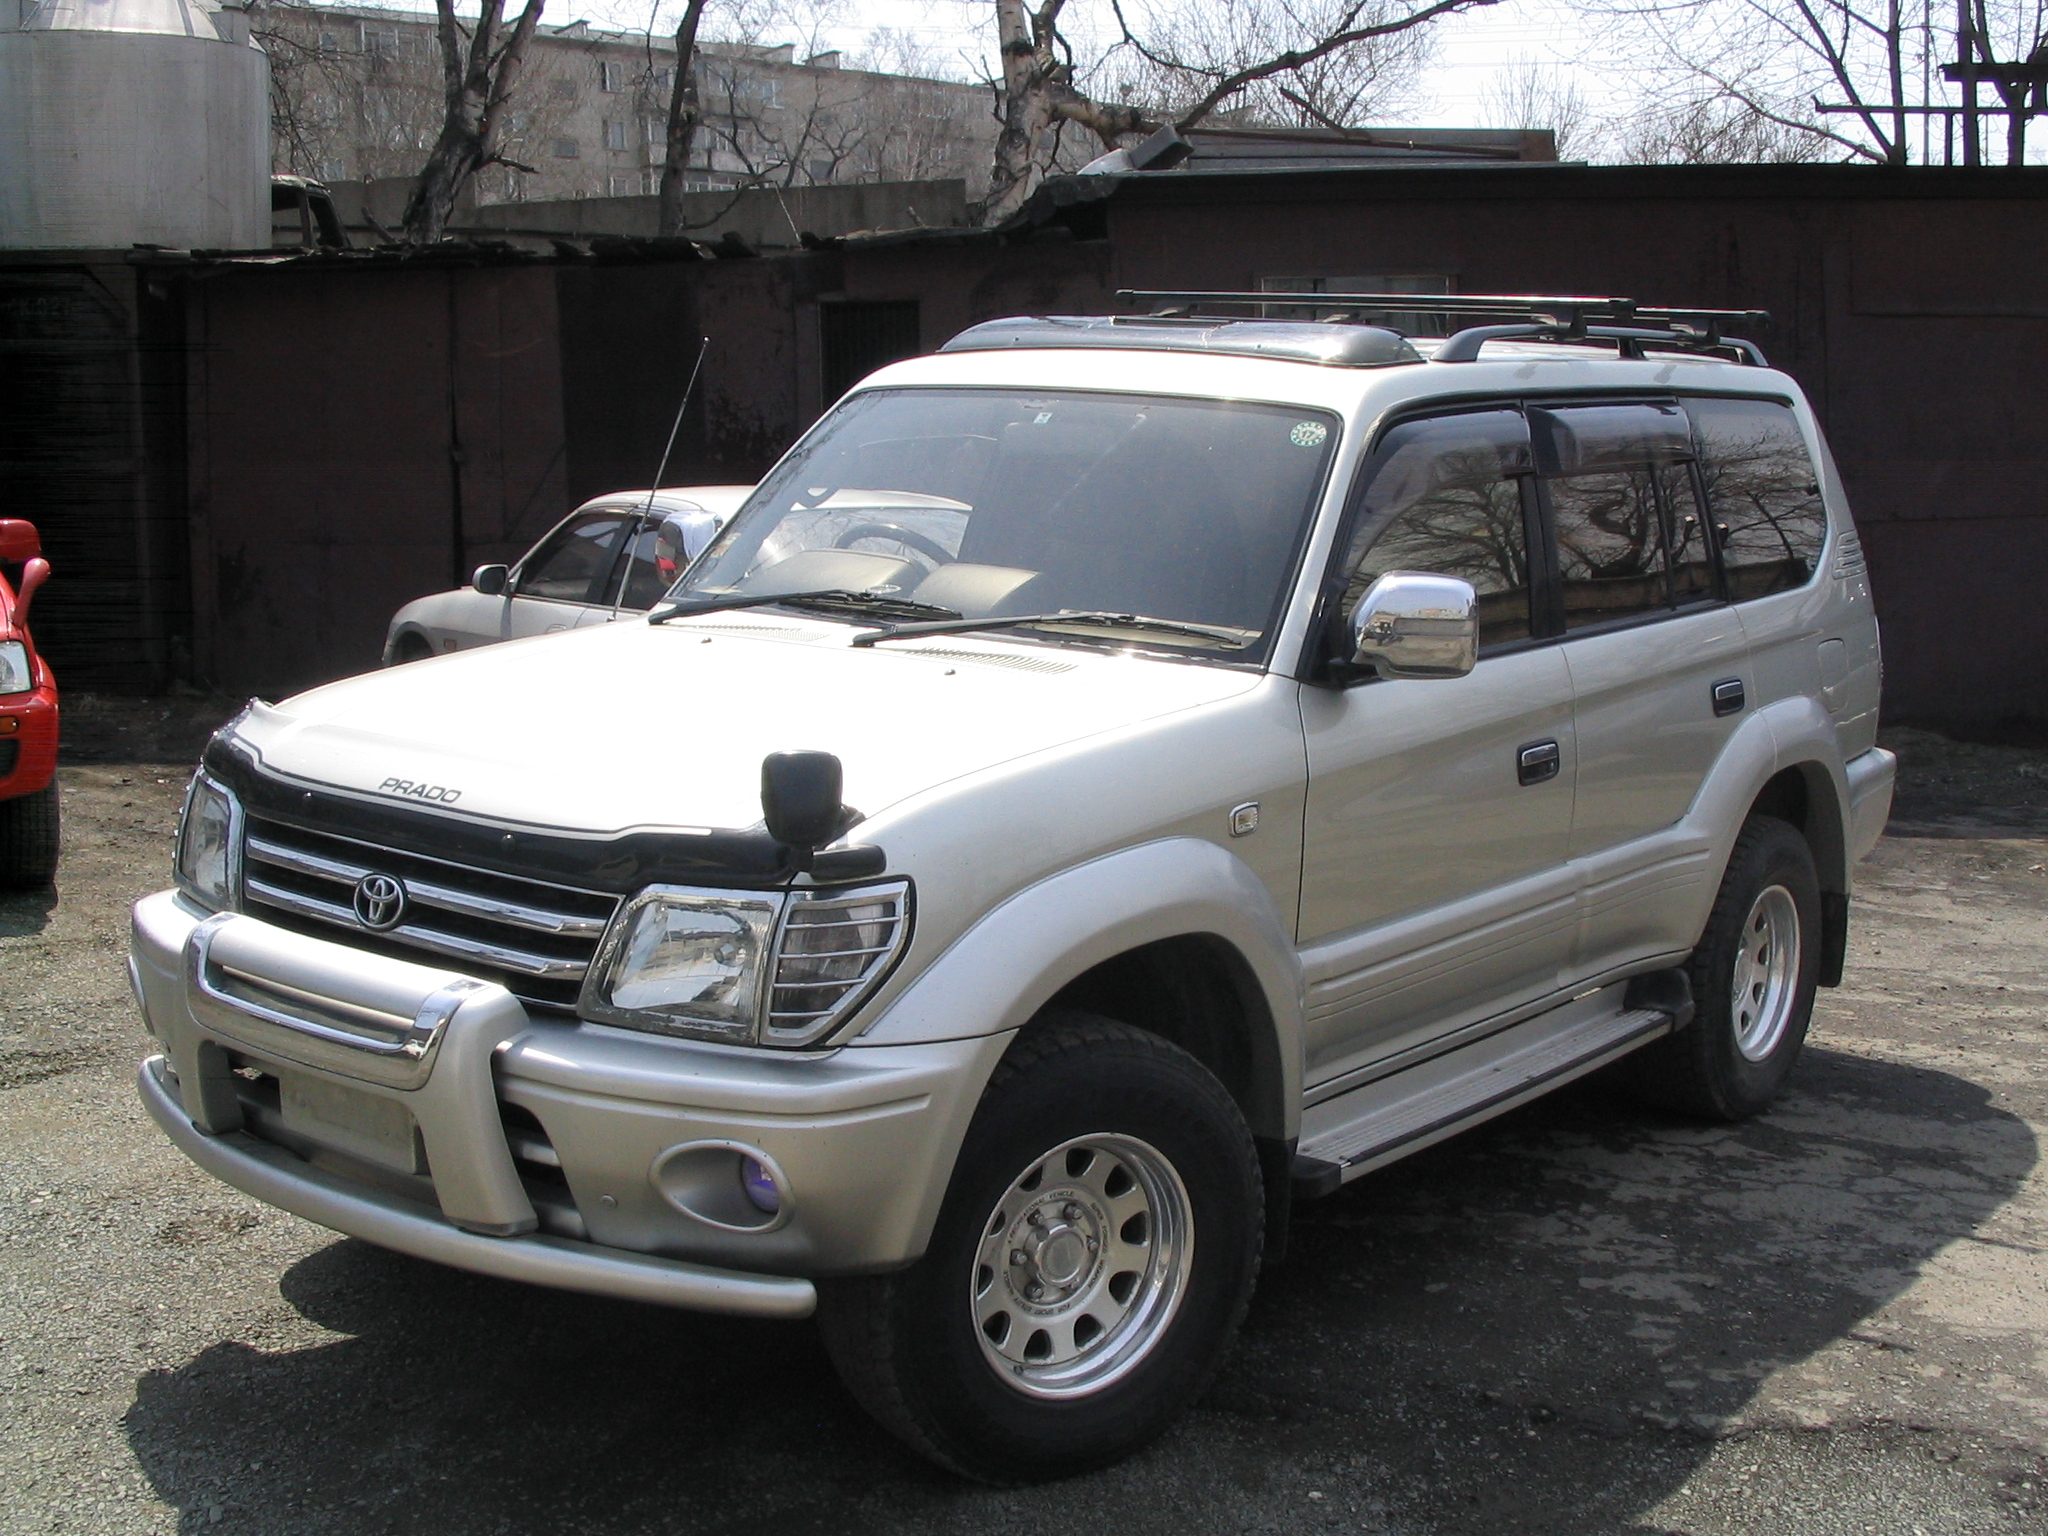 1999 Toyota LAND Cruiser Prado Pictures For Sale